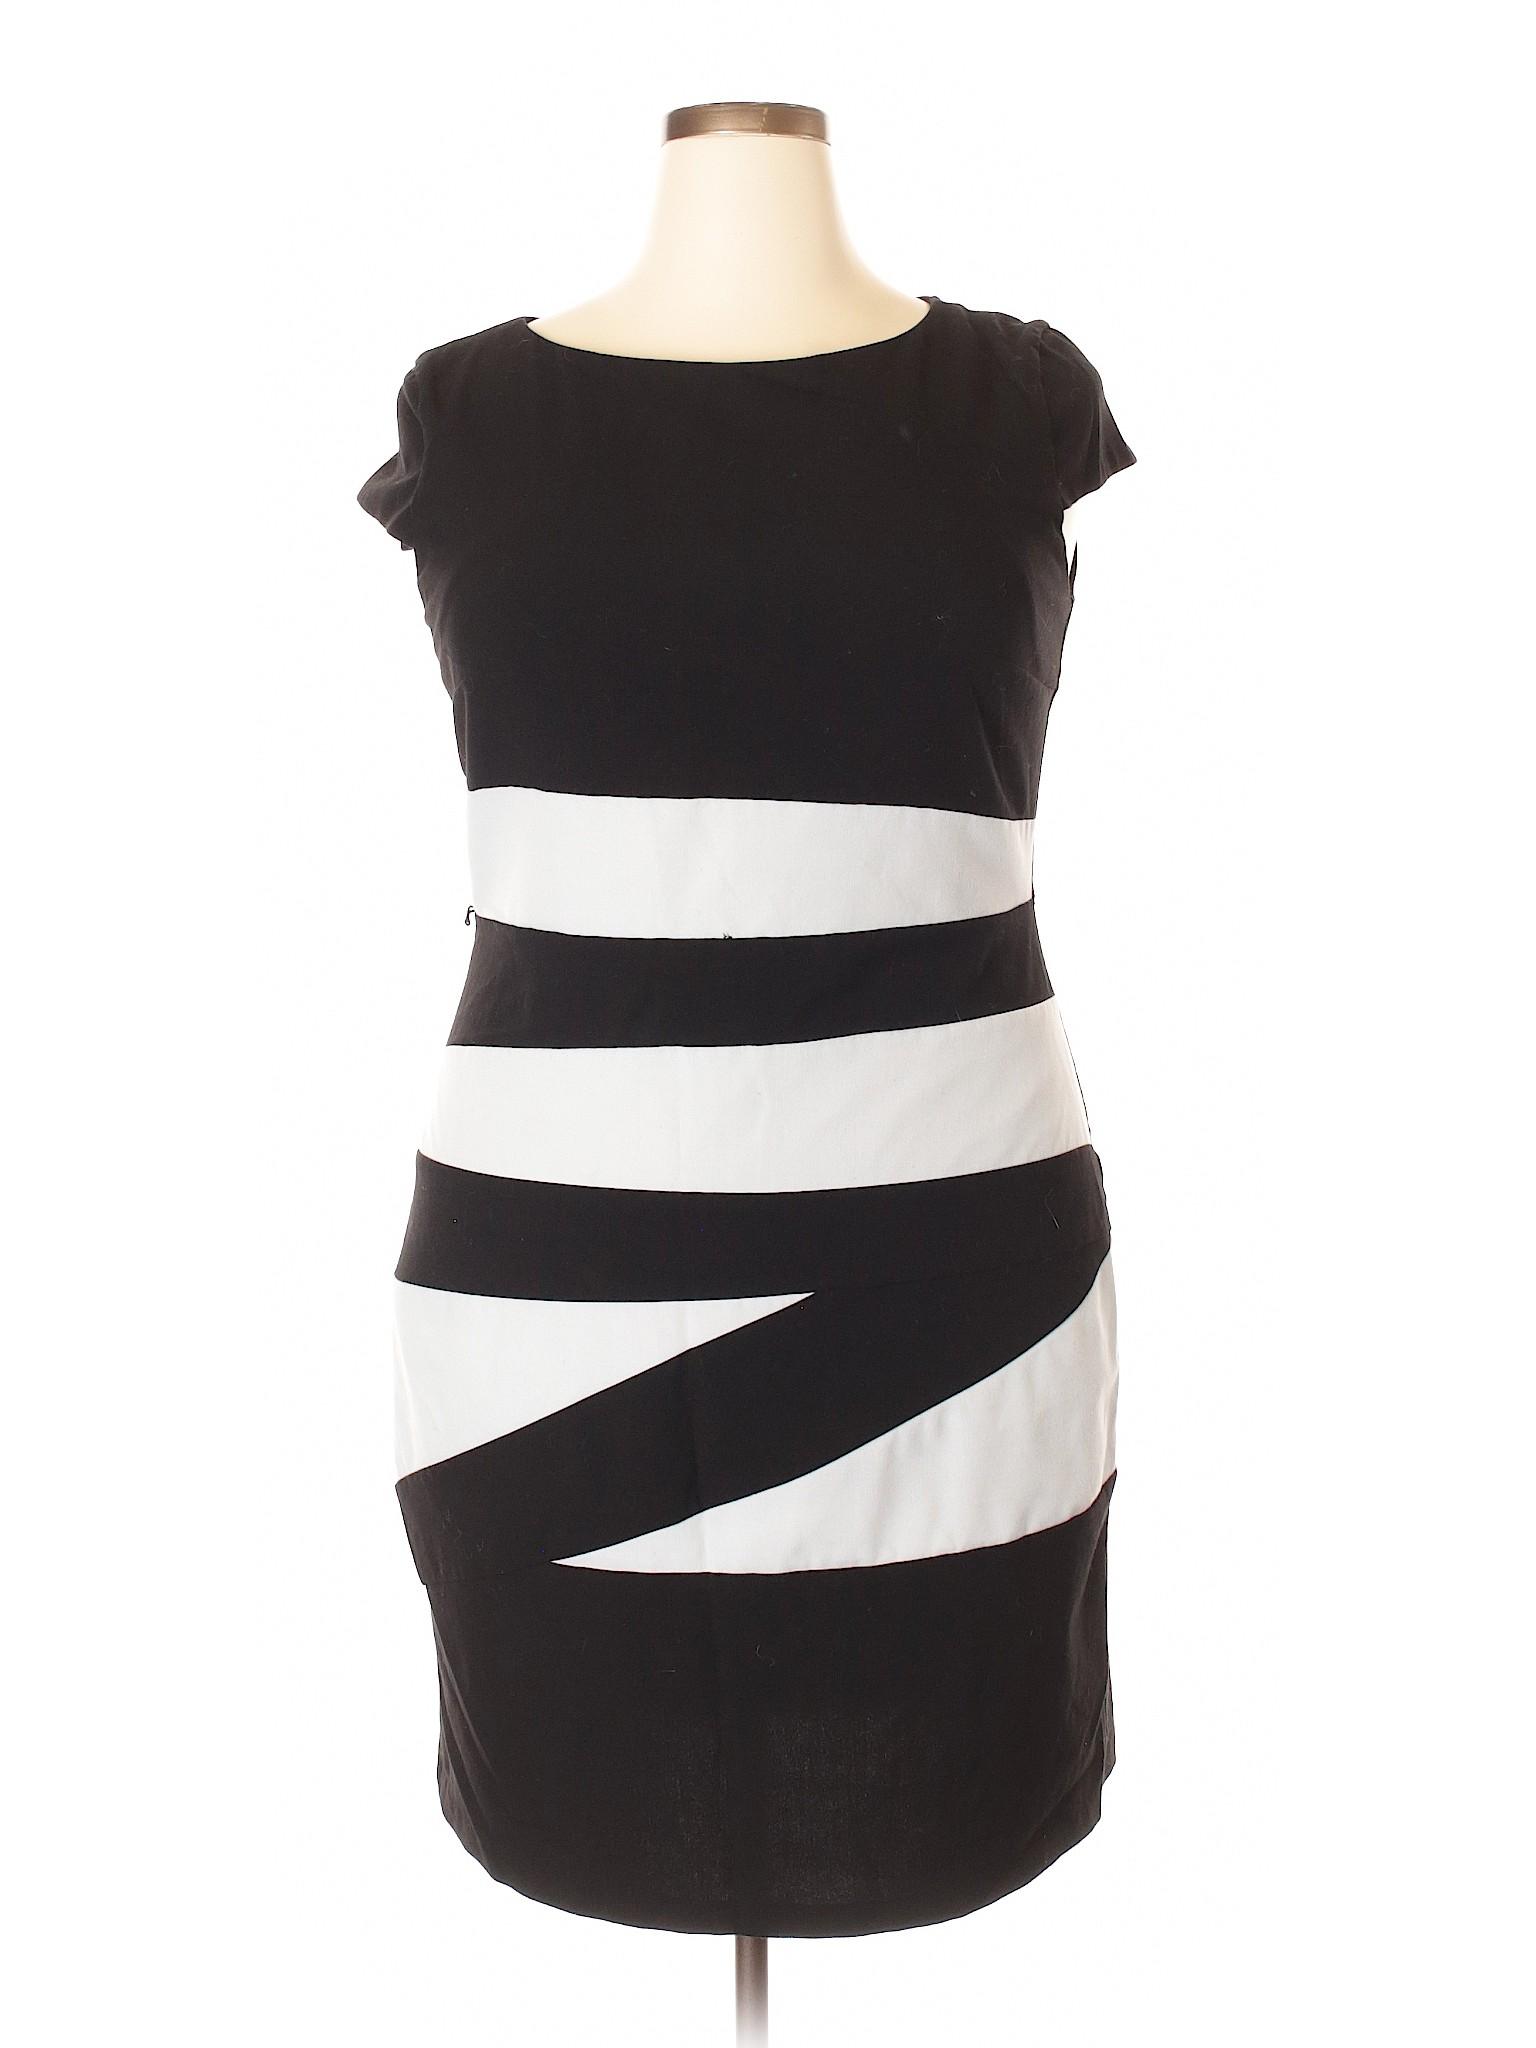 Casual winter Limited Dress Boutique Alyx qOHPw7